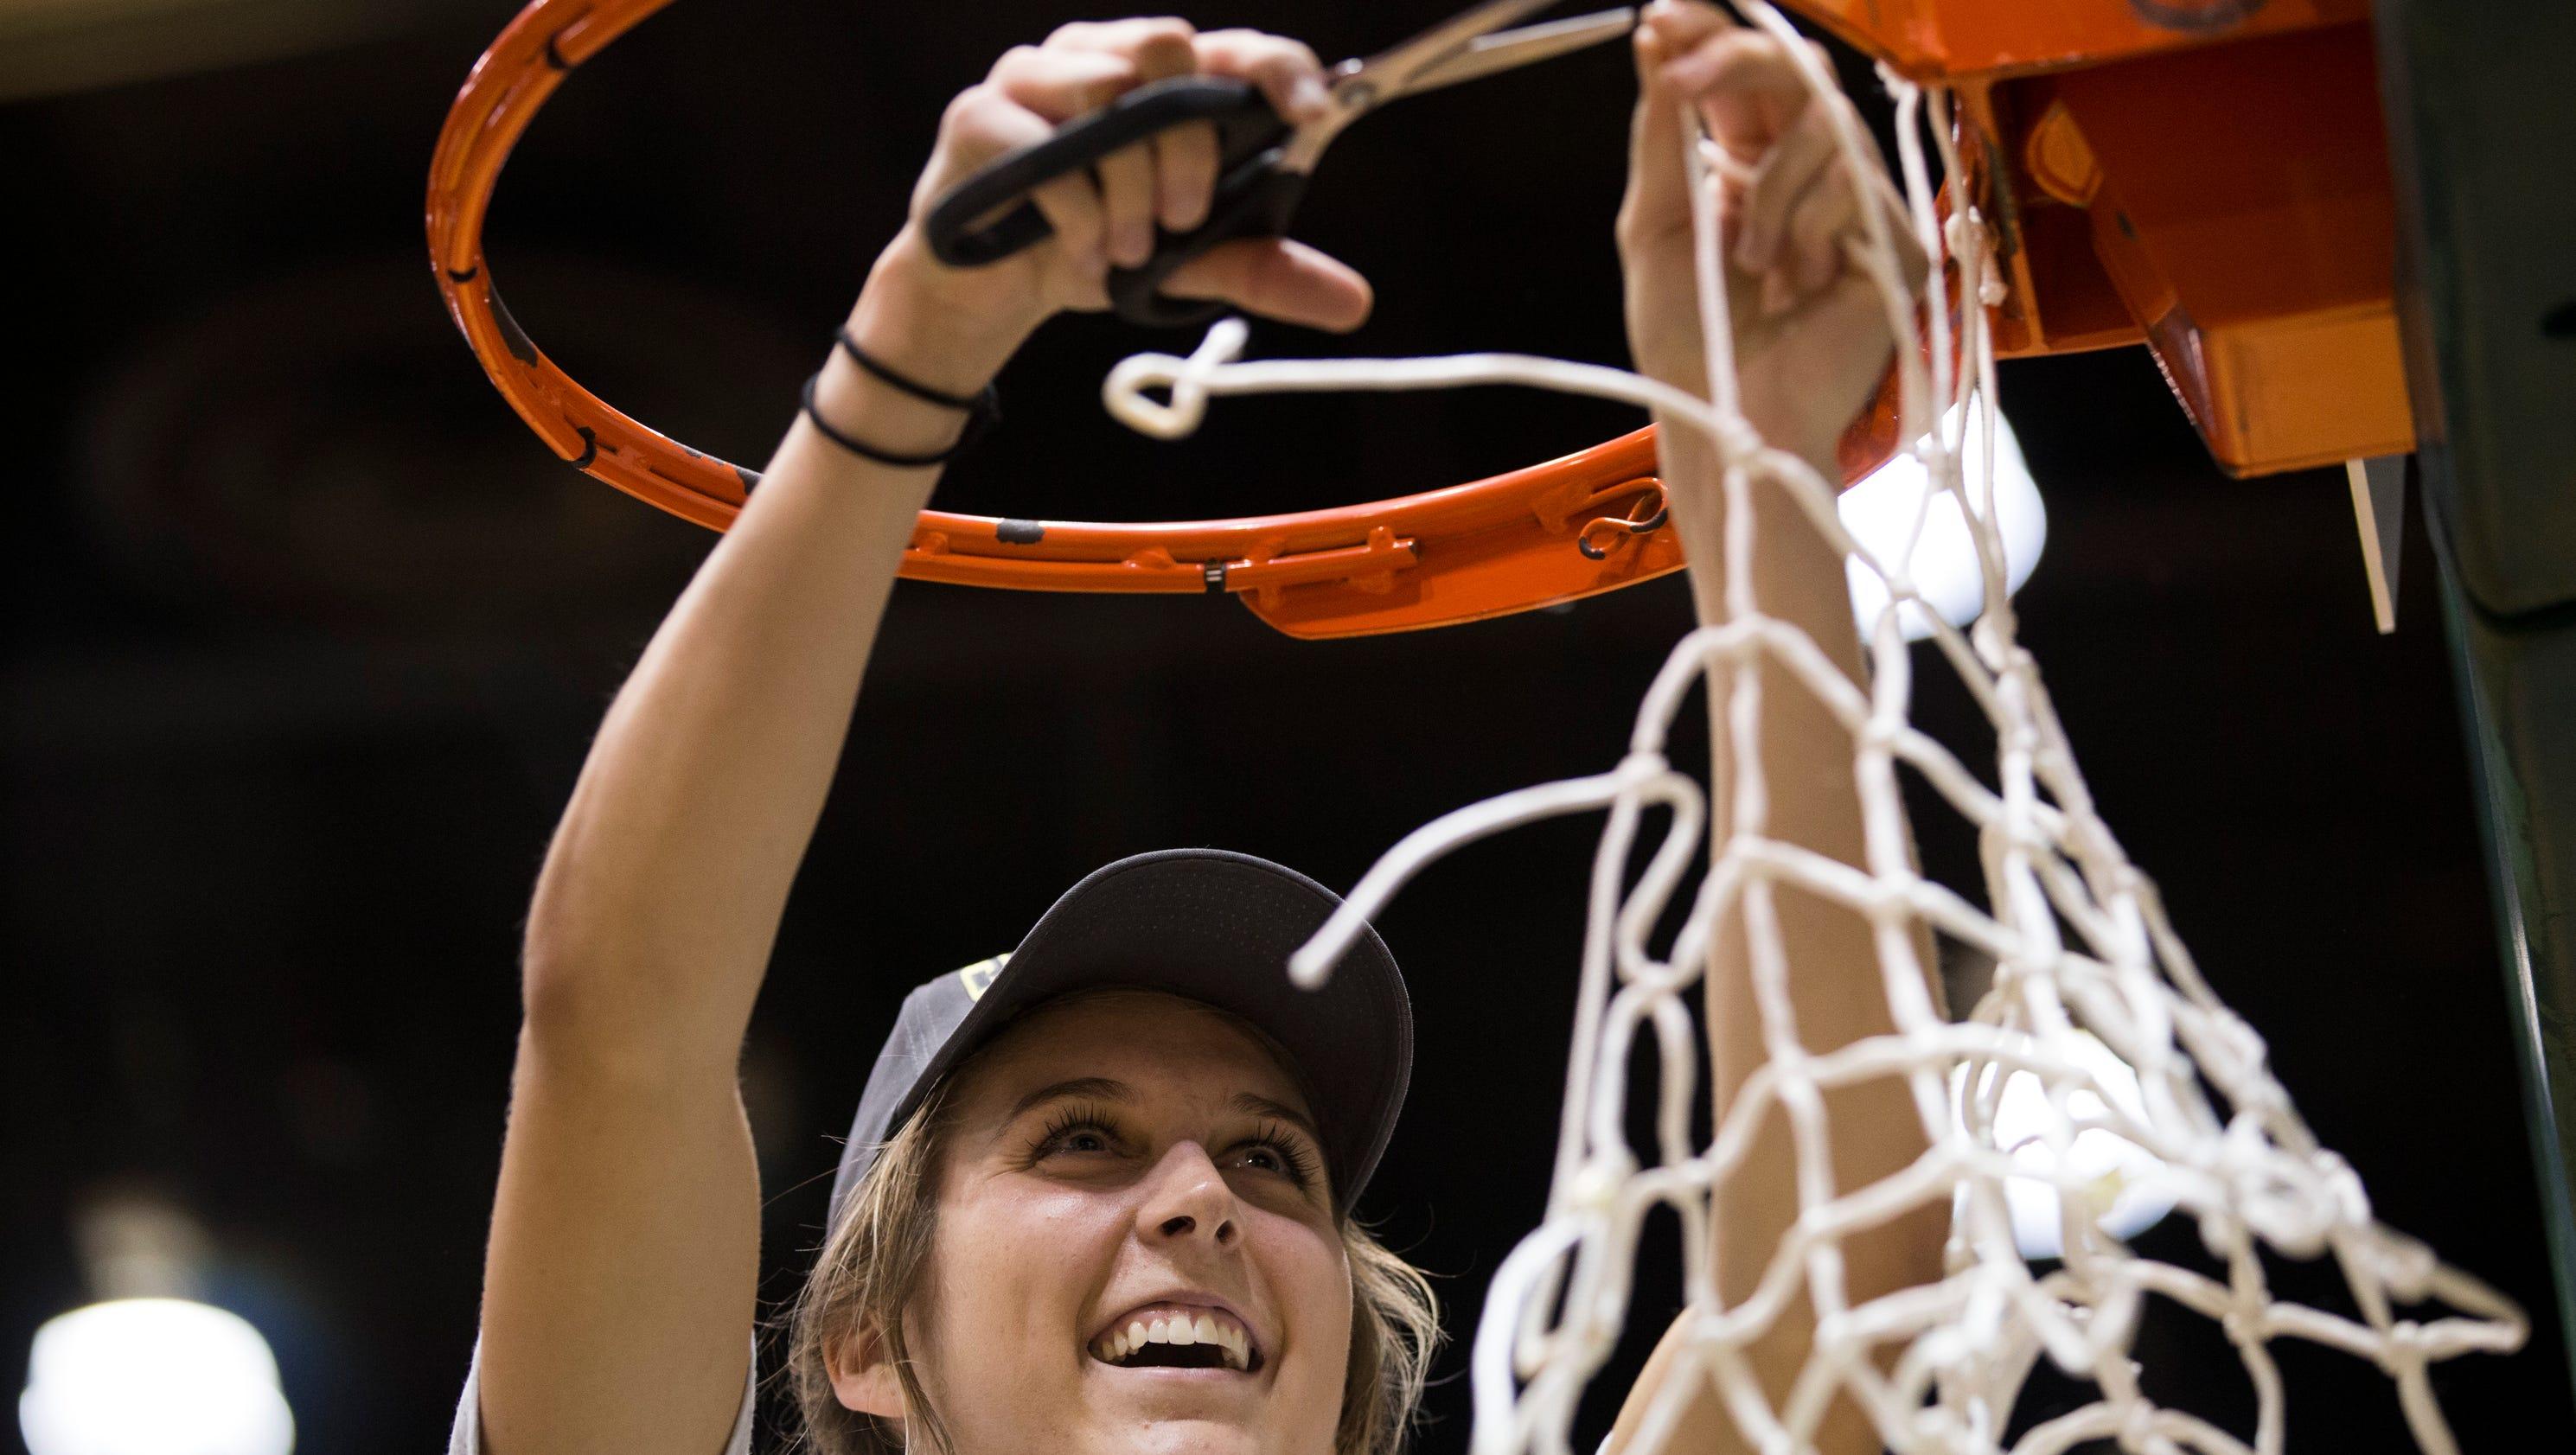 College basketball: FGCU women beat Stetson to win ASUN, earn NCAA bid